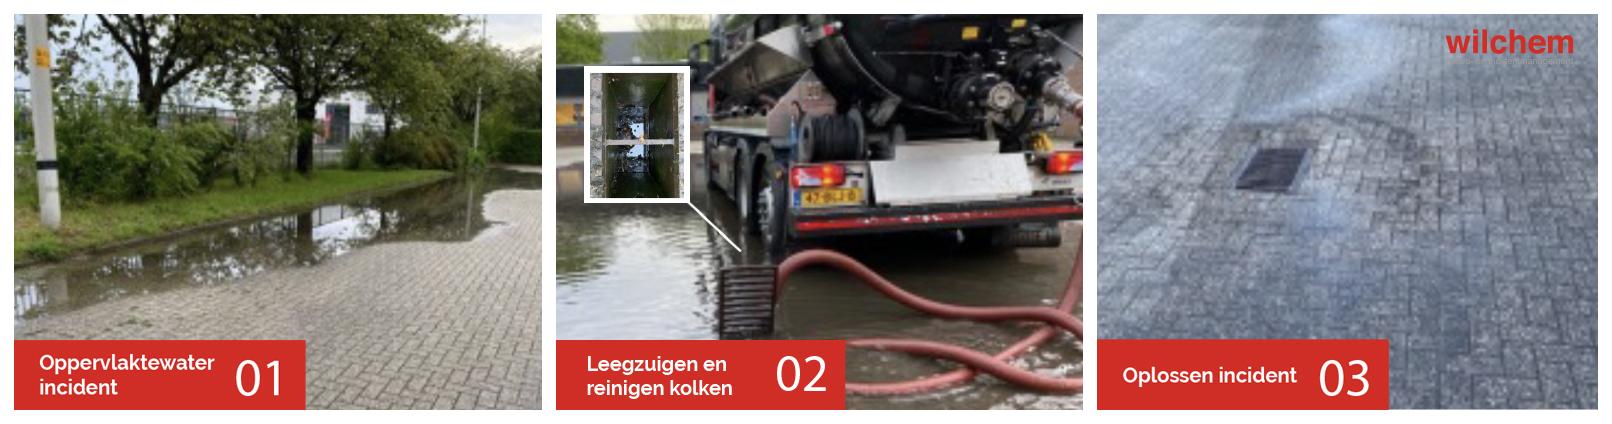 Wateroverlast op de snelweg? Wilchem lost dit probleem op!.jpg